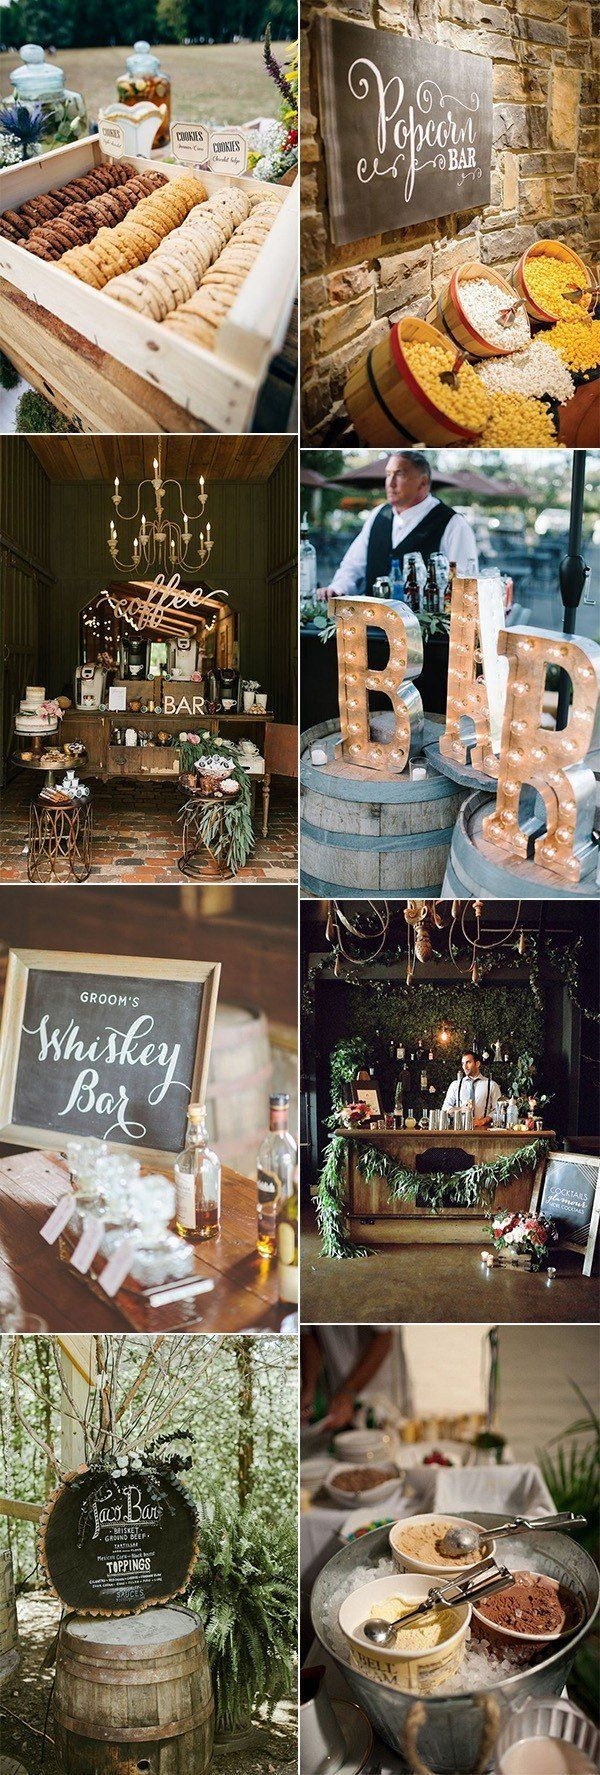 Trending 15 Wedding Reception Bar Ideas For 2018 Pinterest